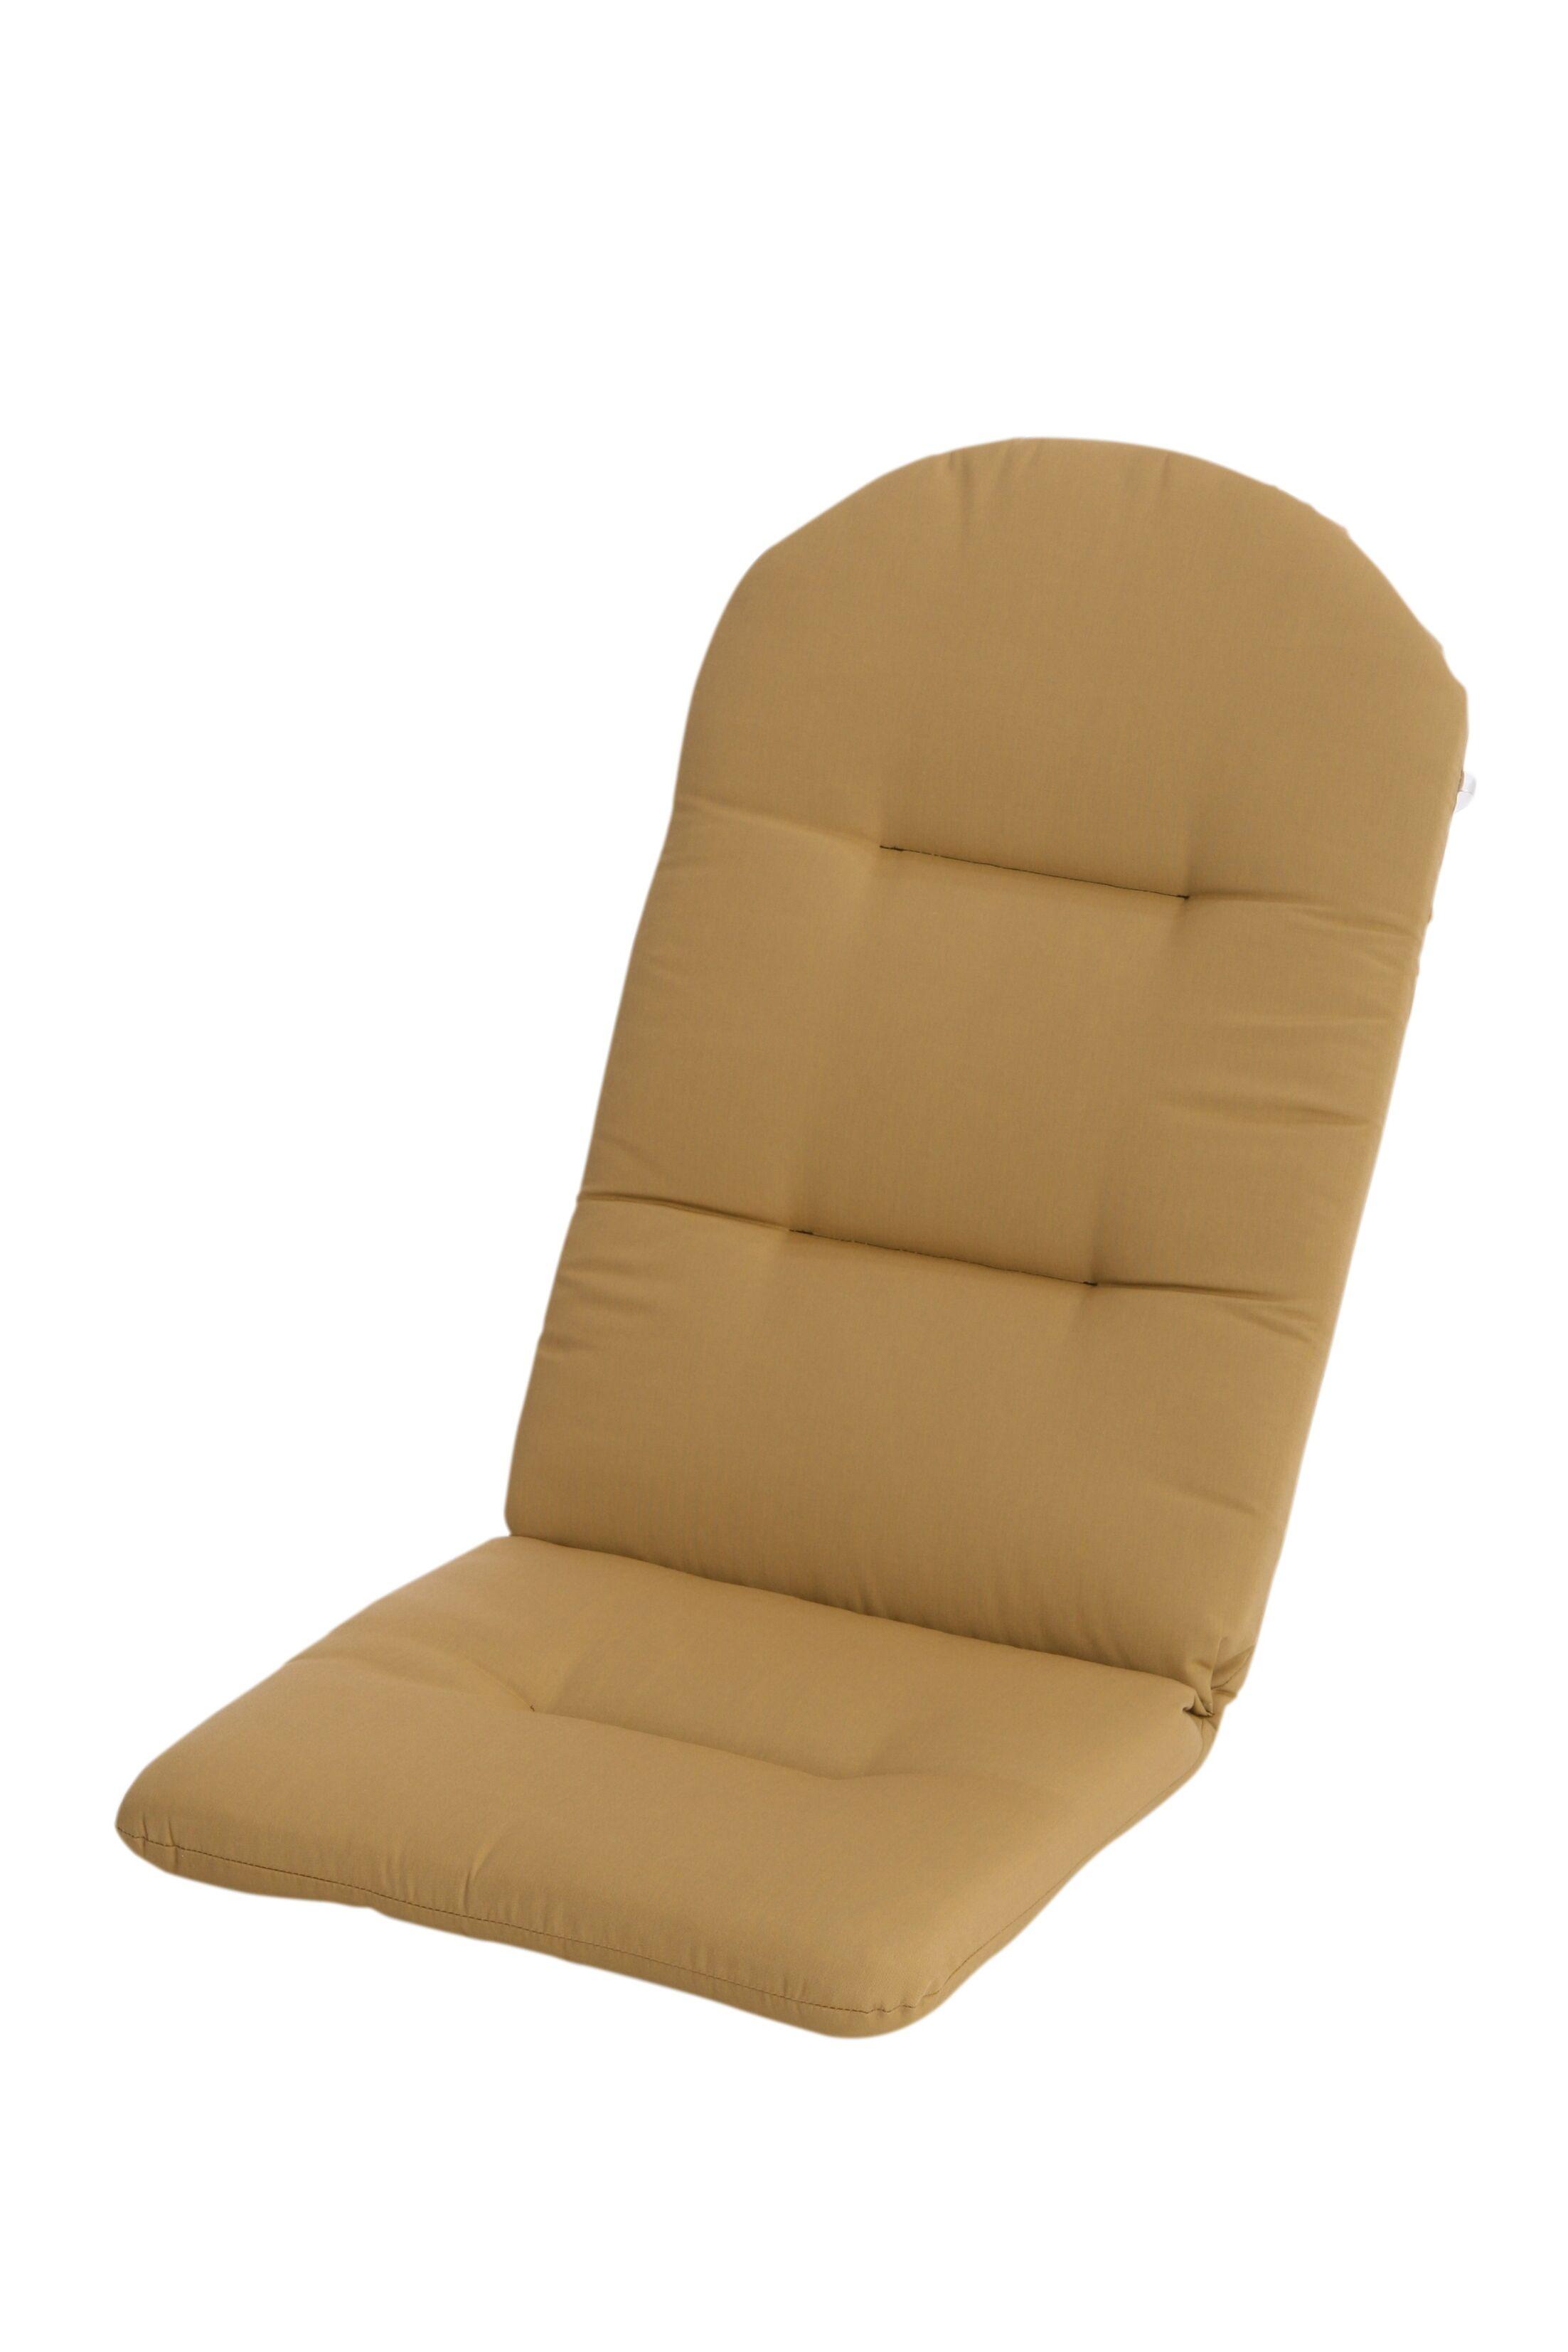 Mindi Indoor/Outdoor Sunbrella Adirondack Chair Cushion Fabric: Brass